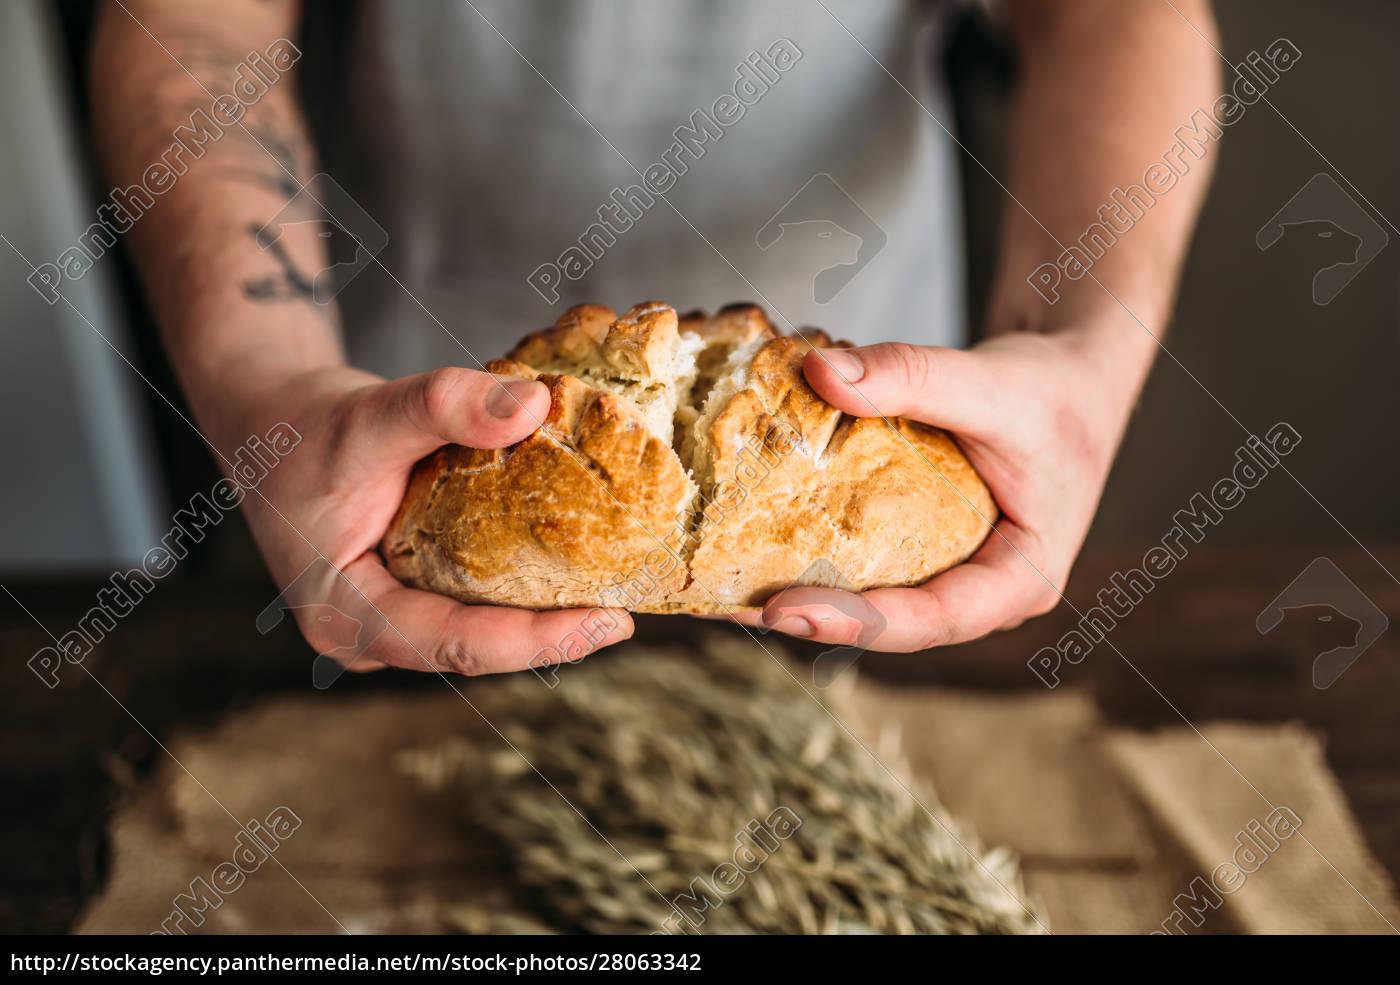 baker, hands, breaks, in, half, fresh - 28063342